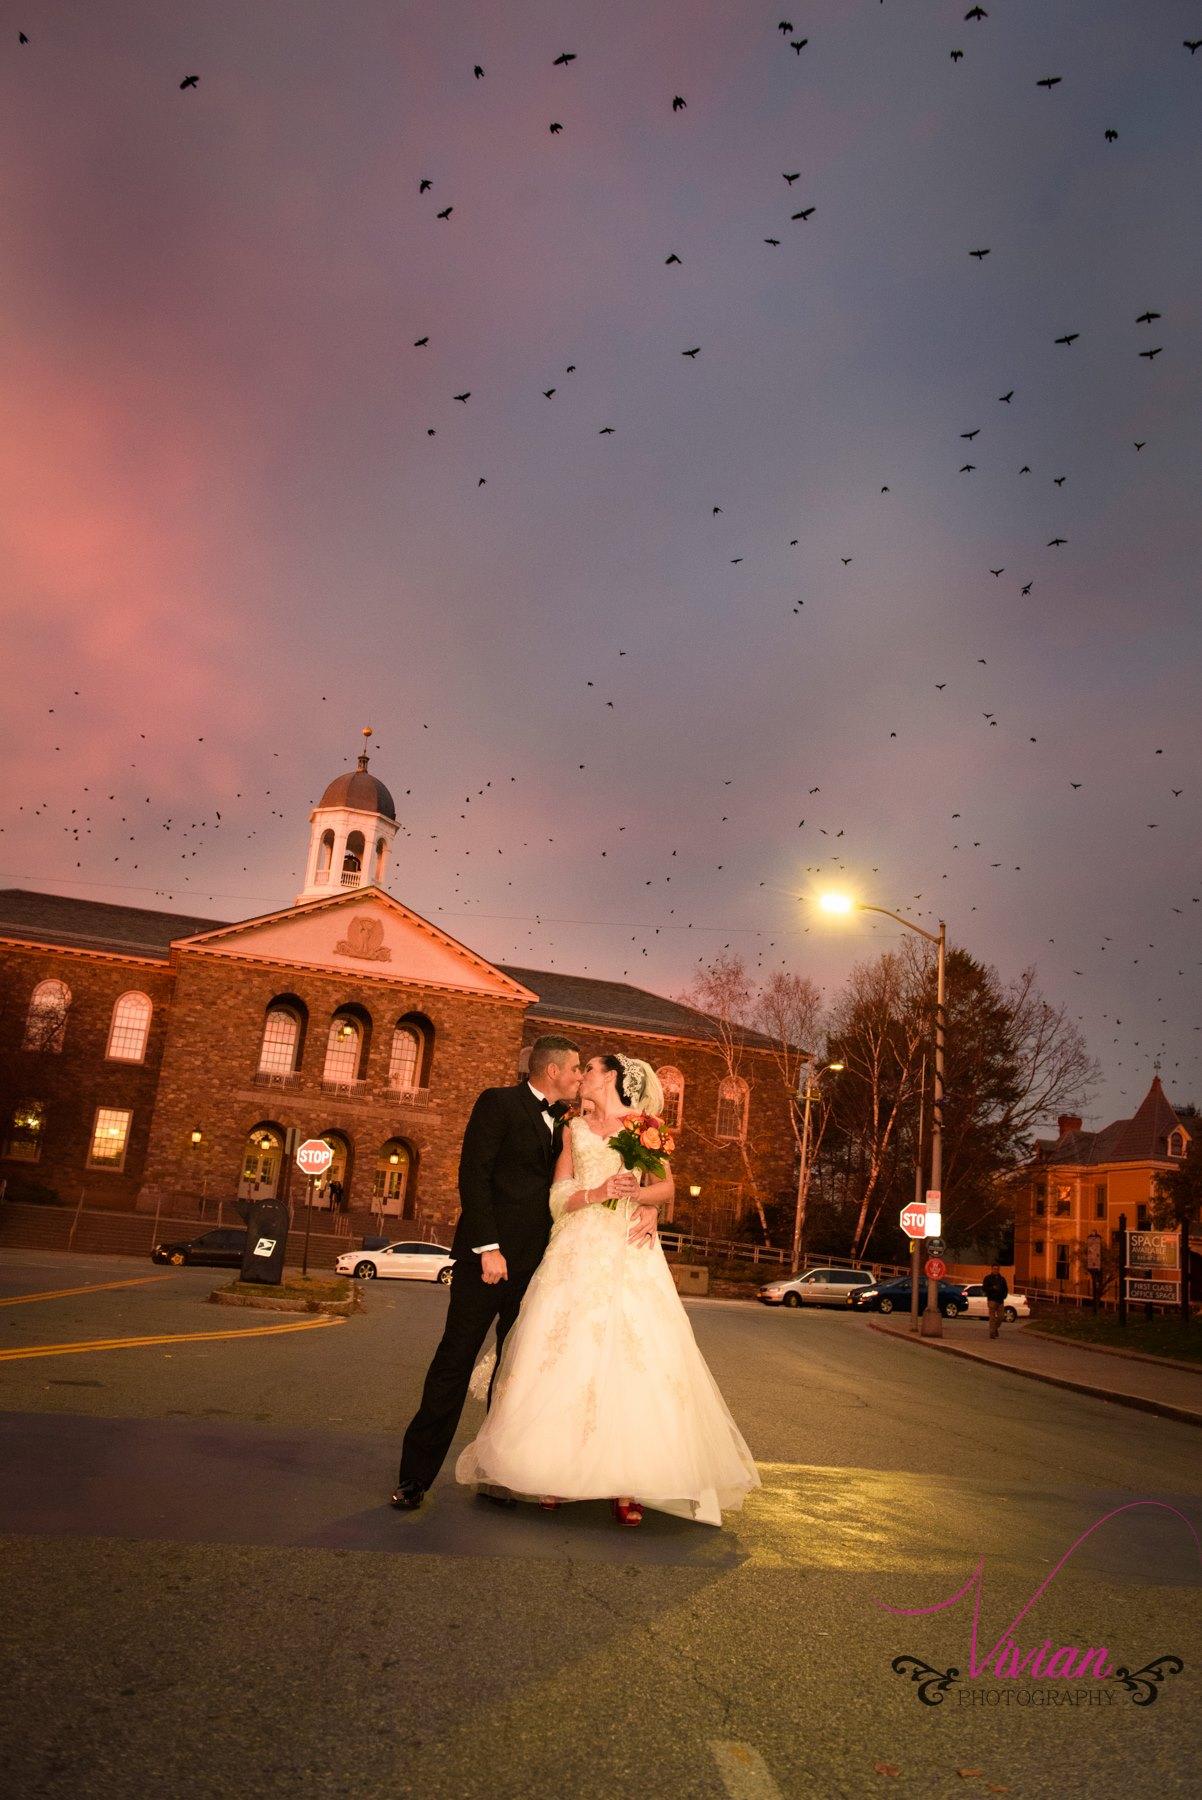 bride-and-groom-kissing-birds-flying-overhead.jpg